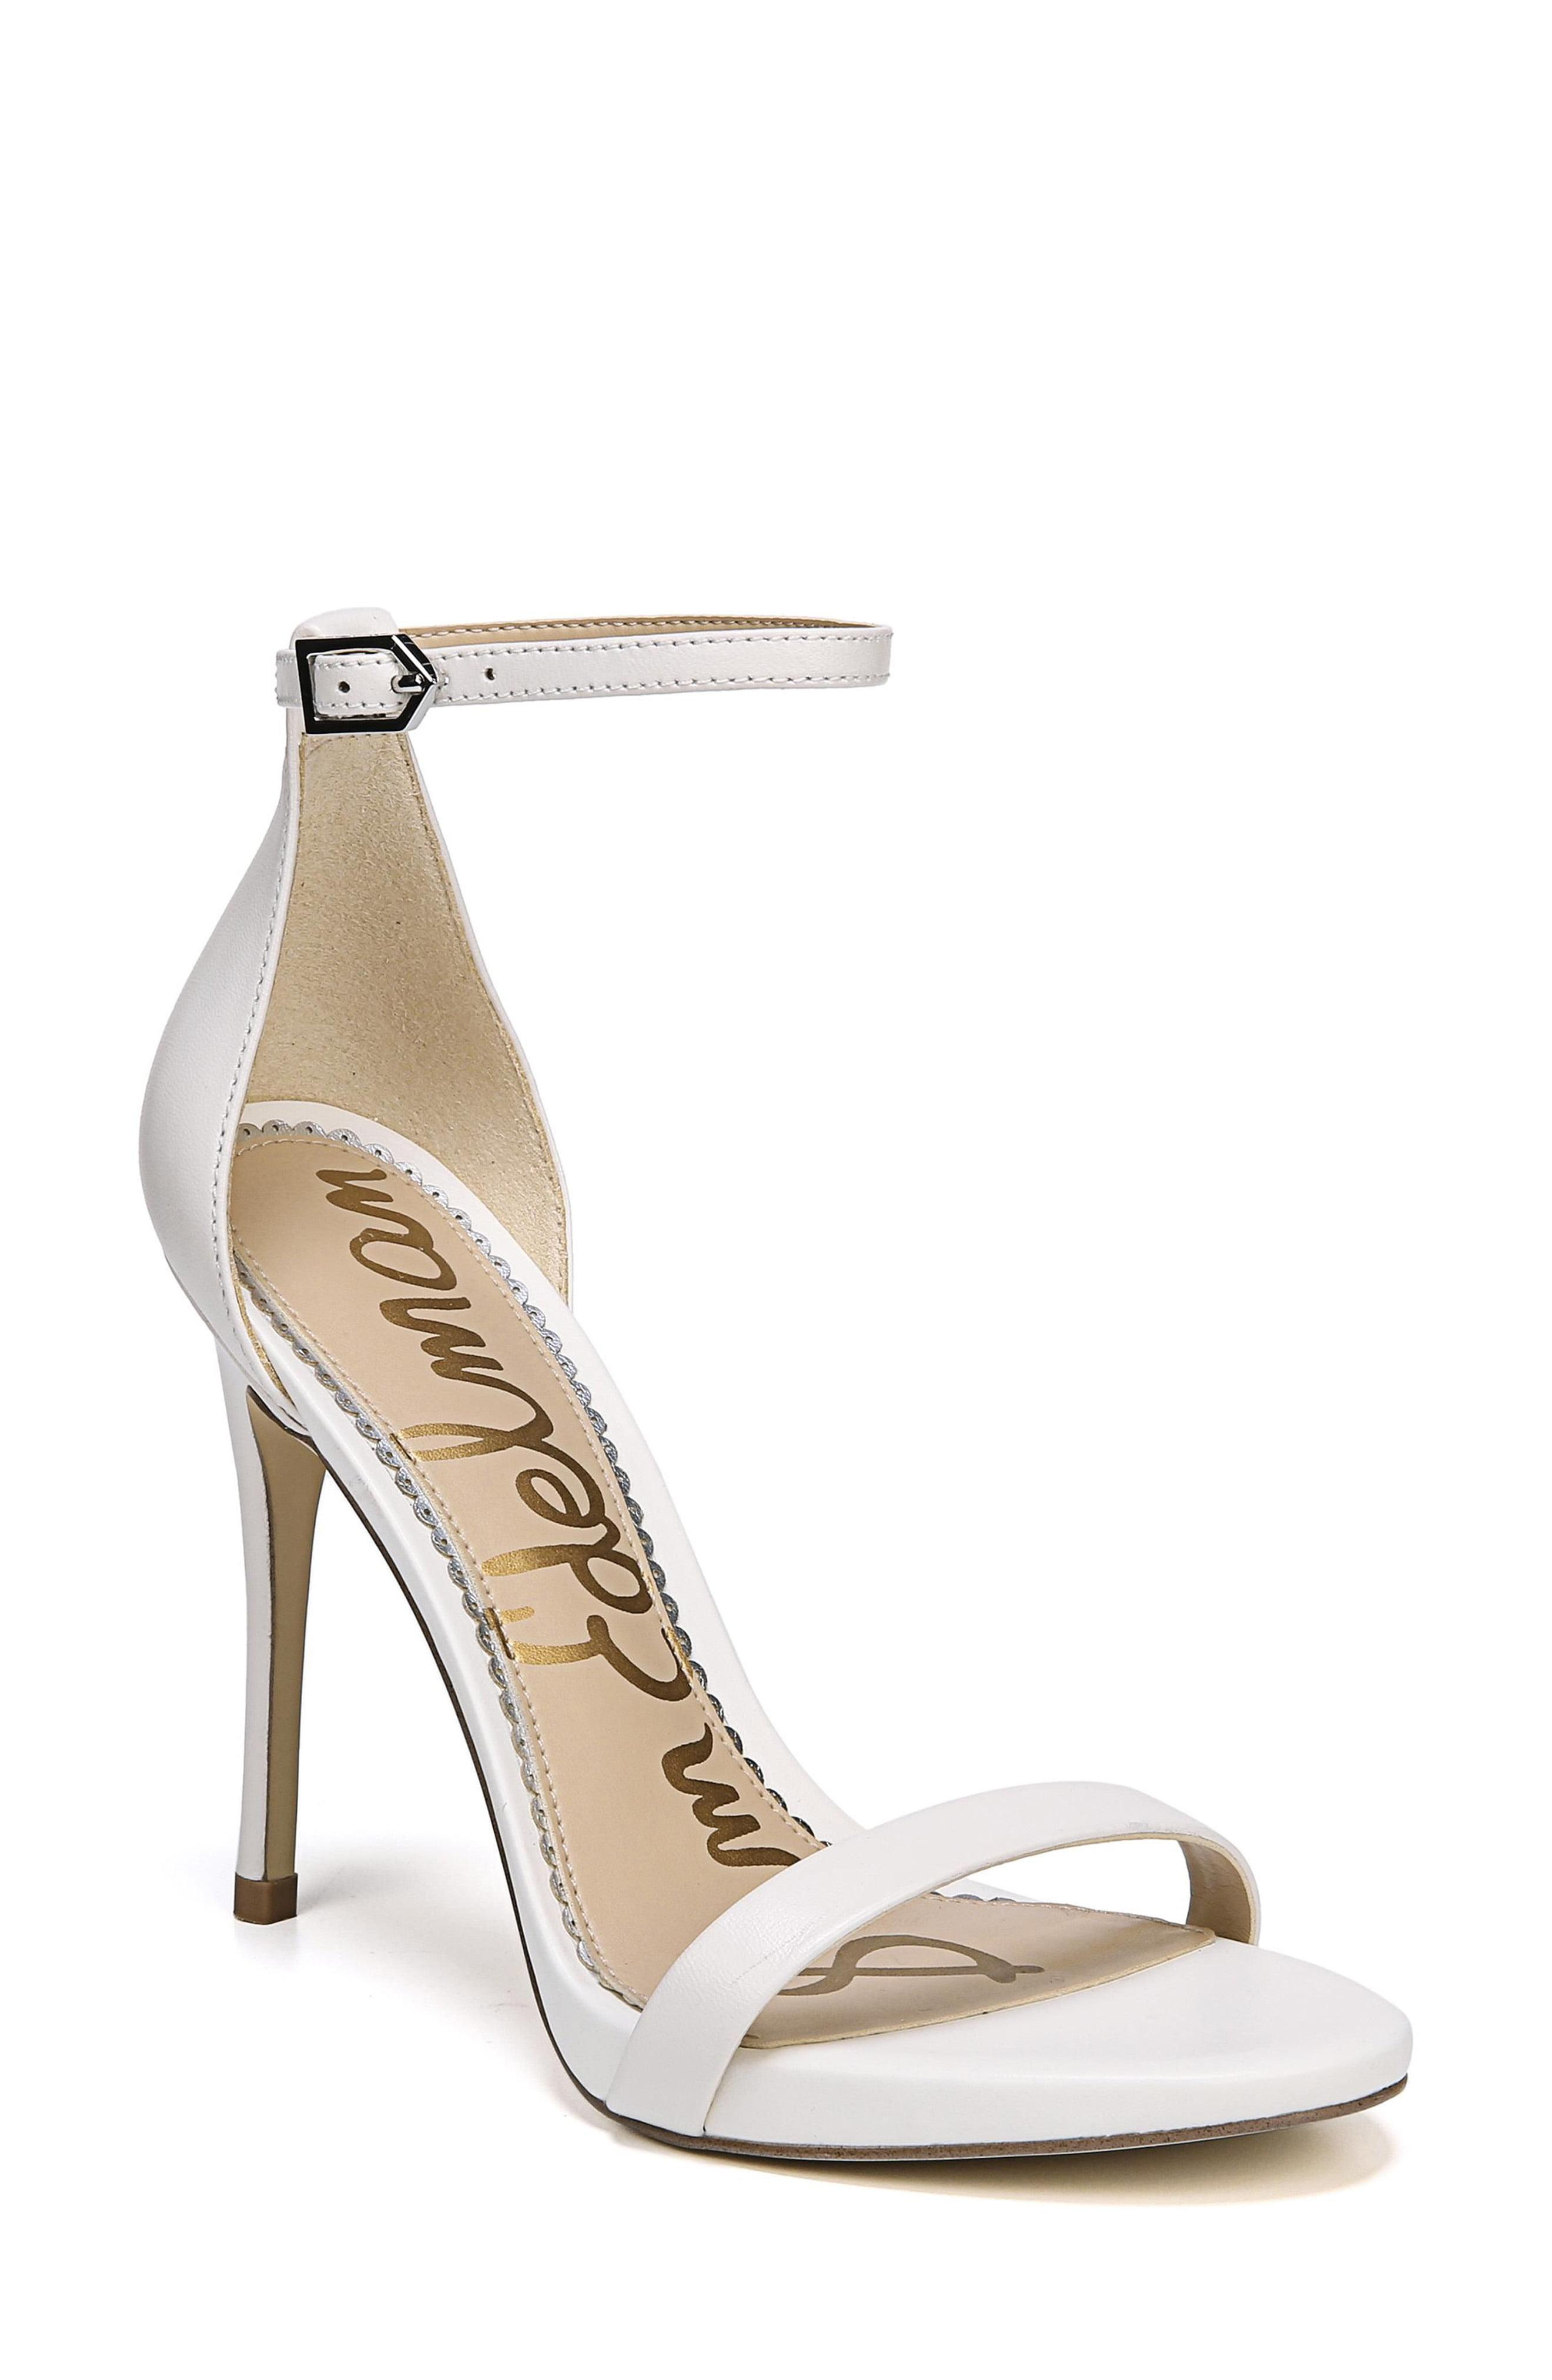 2b7cb53ae1a Lyst - Sam Edelman Women s Ariella Leather Sandals - Bright White in ...